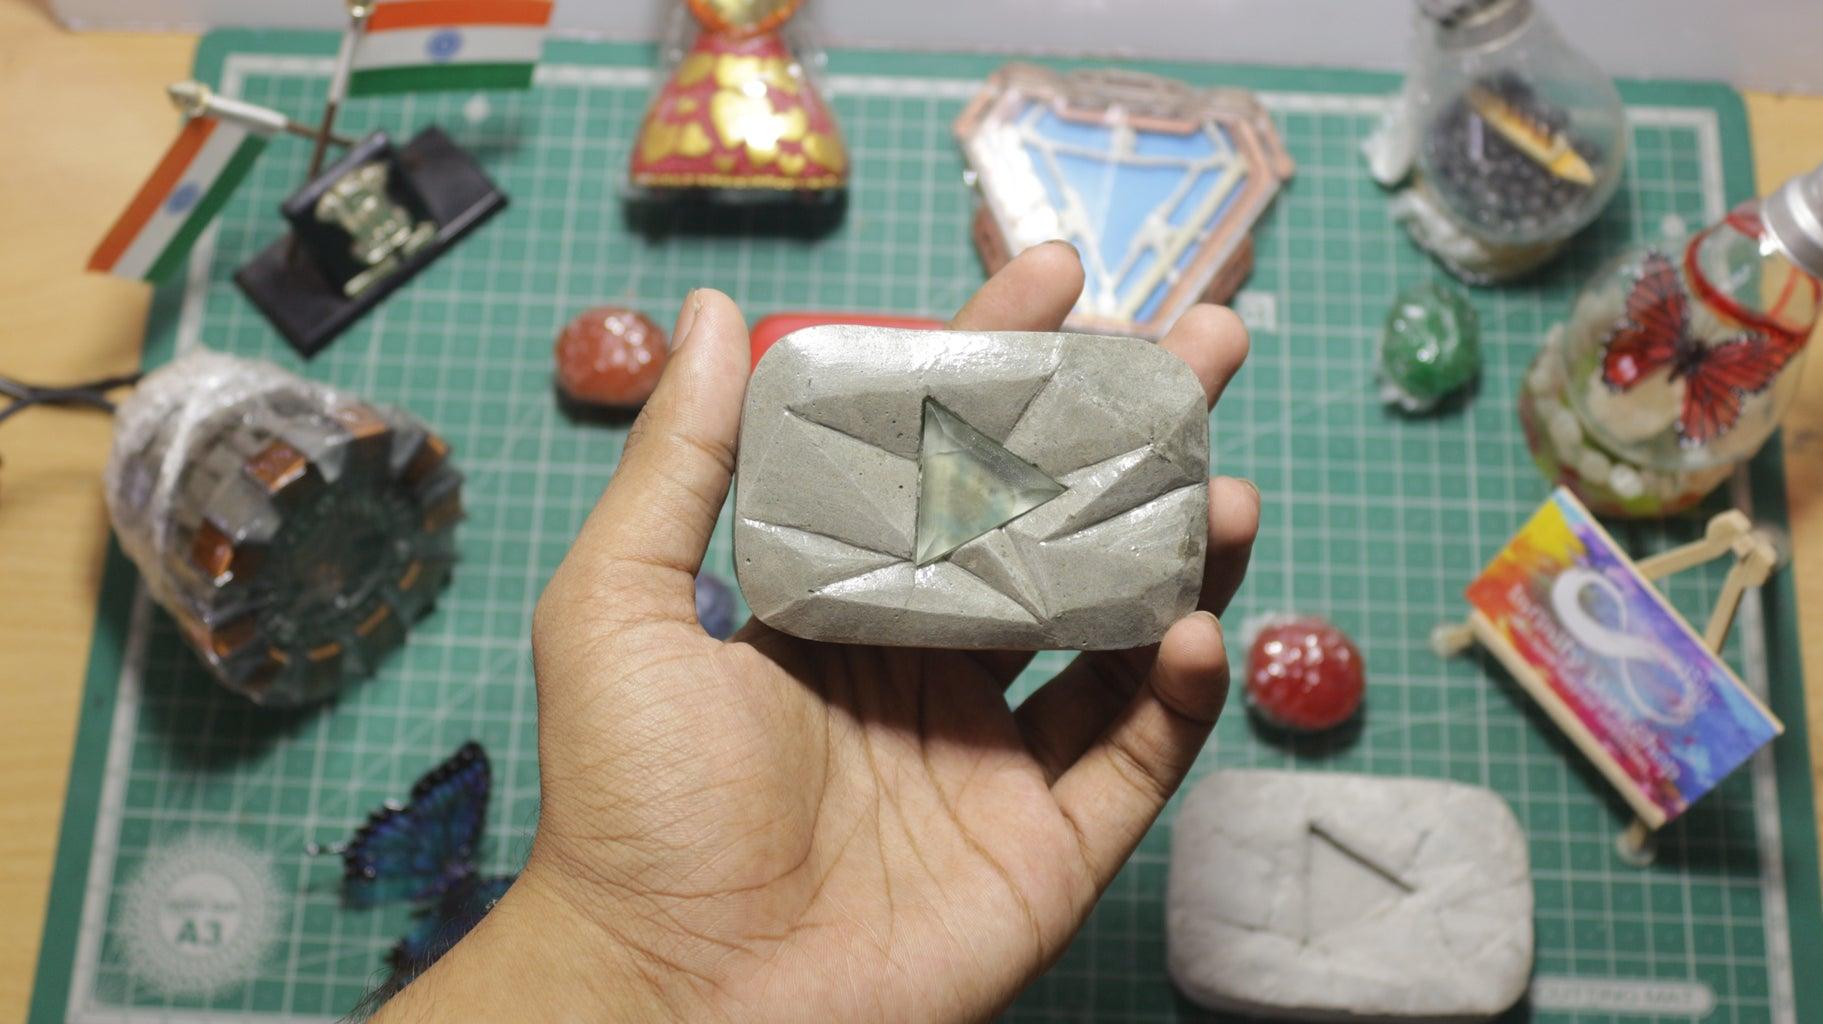 Concrete Youtube Diamond Play Button Paperweight